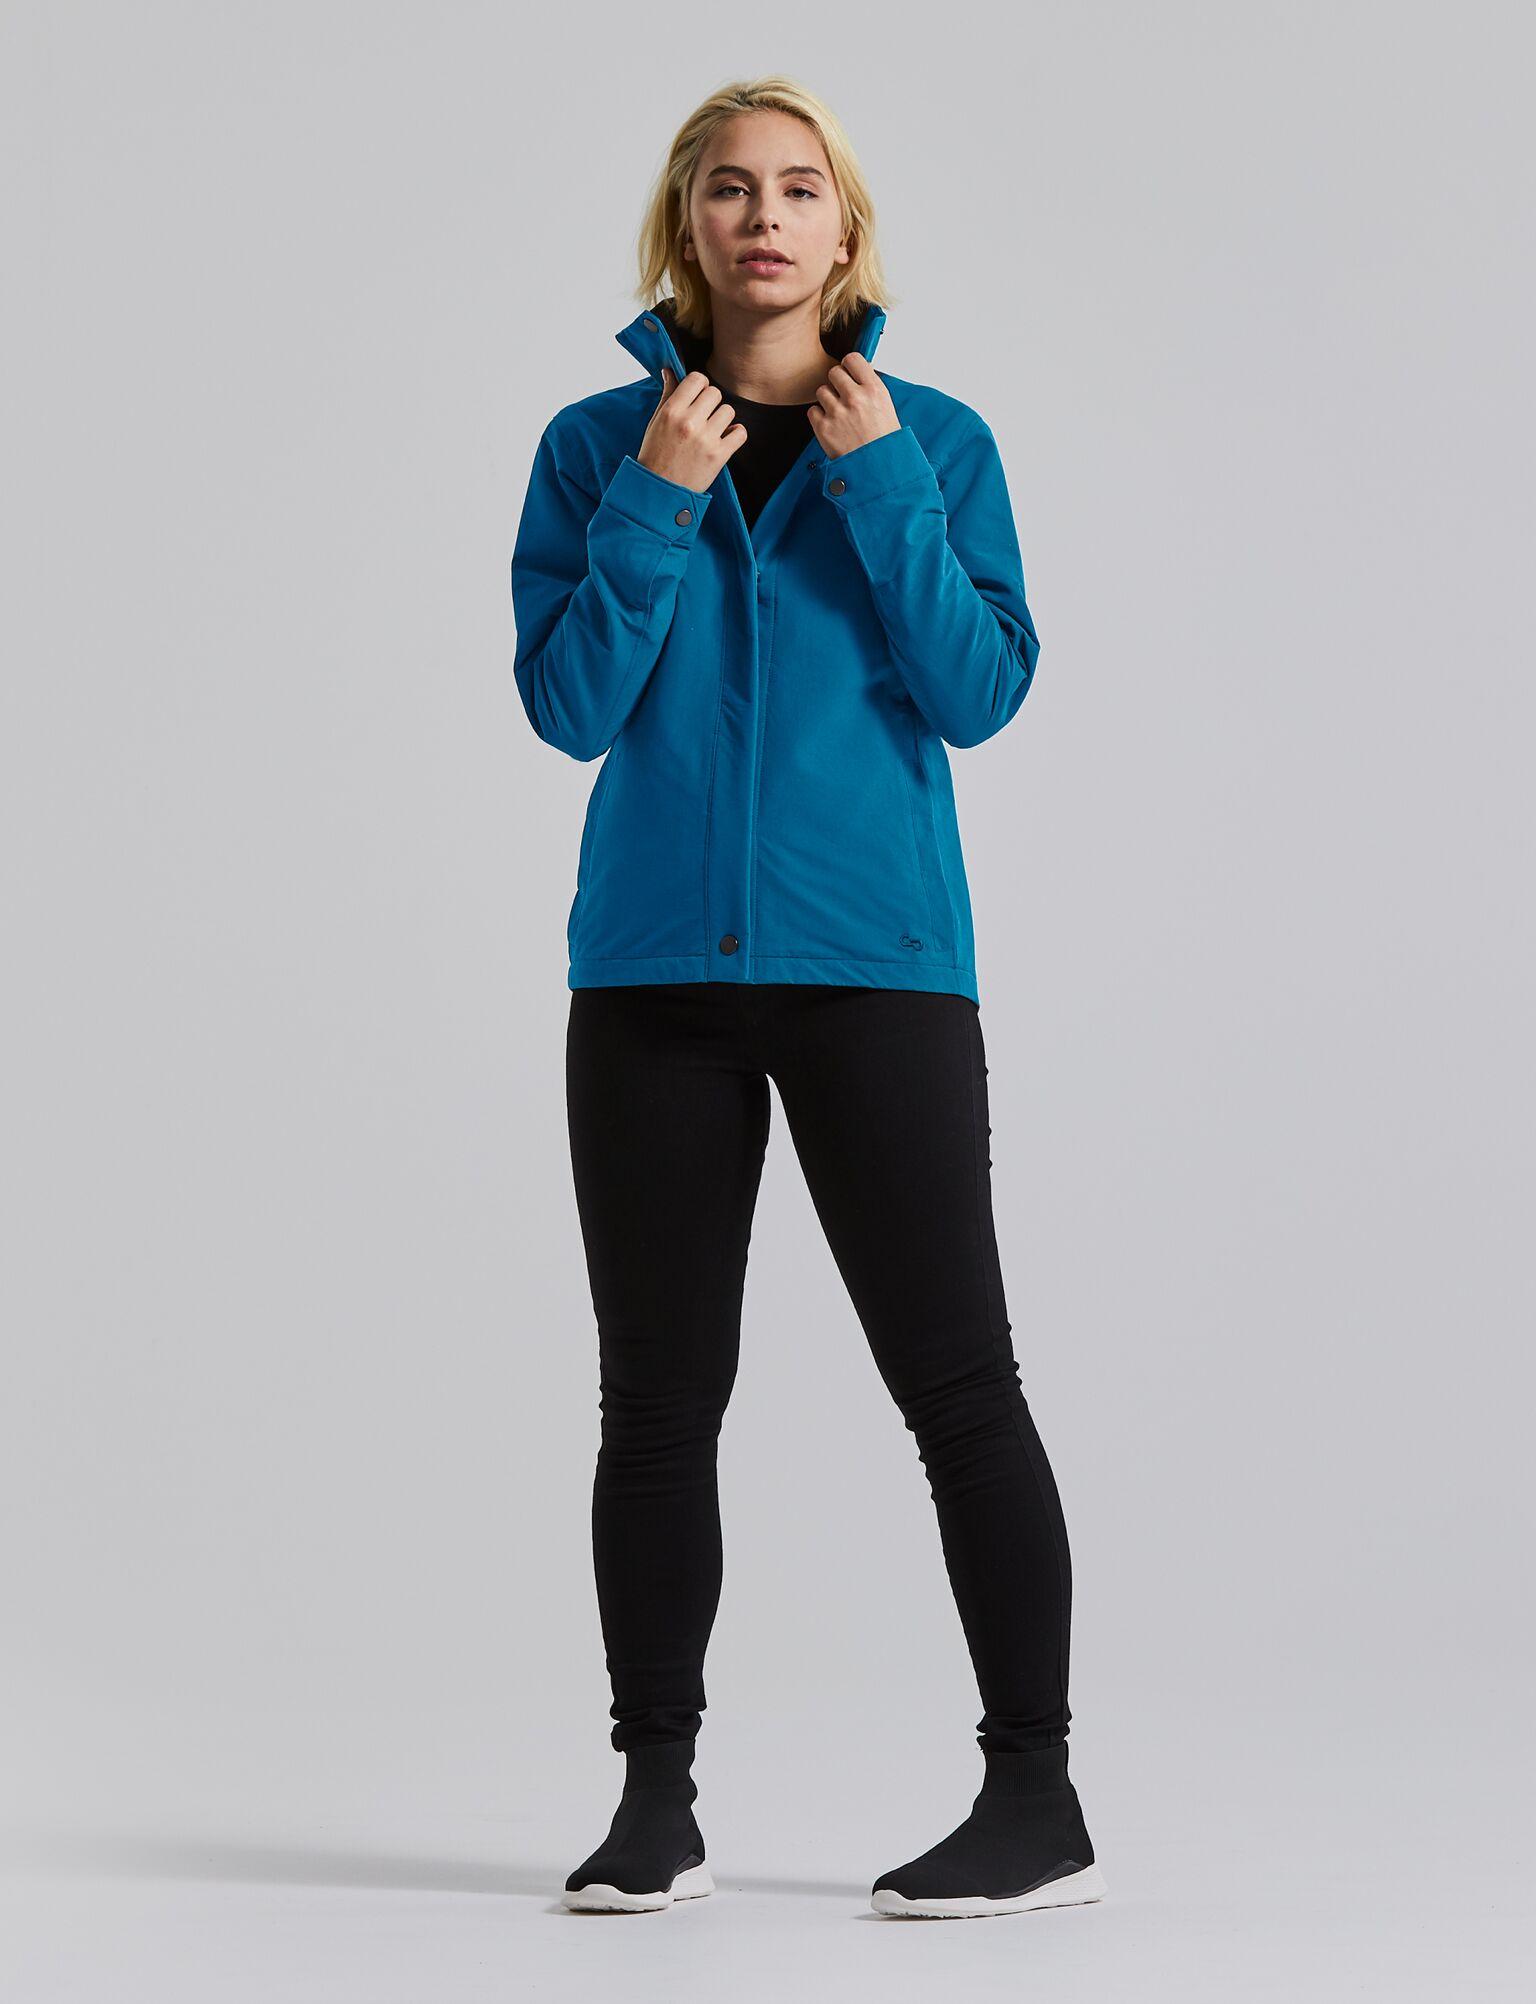 Shop Women's Voyager Jacket